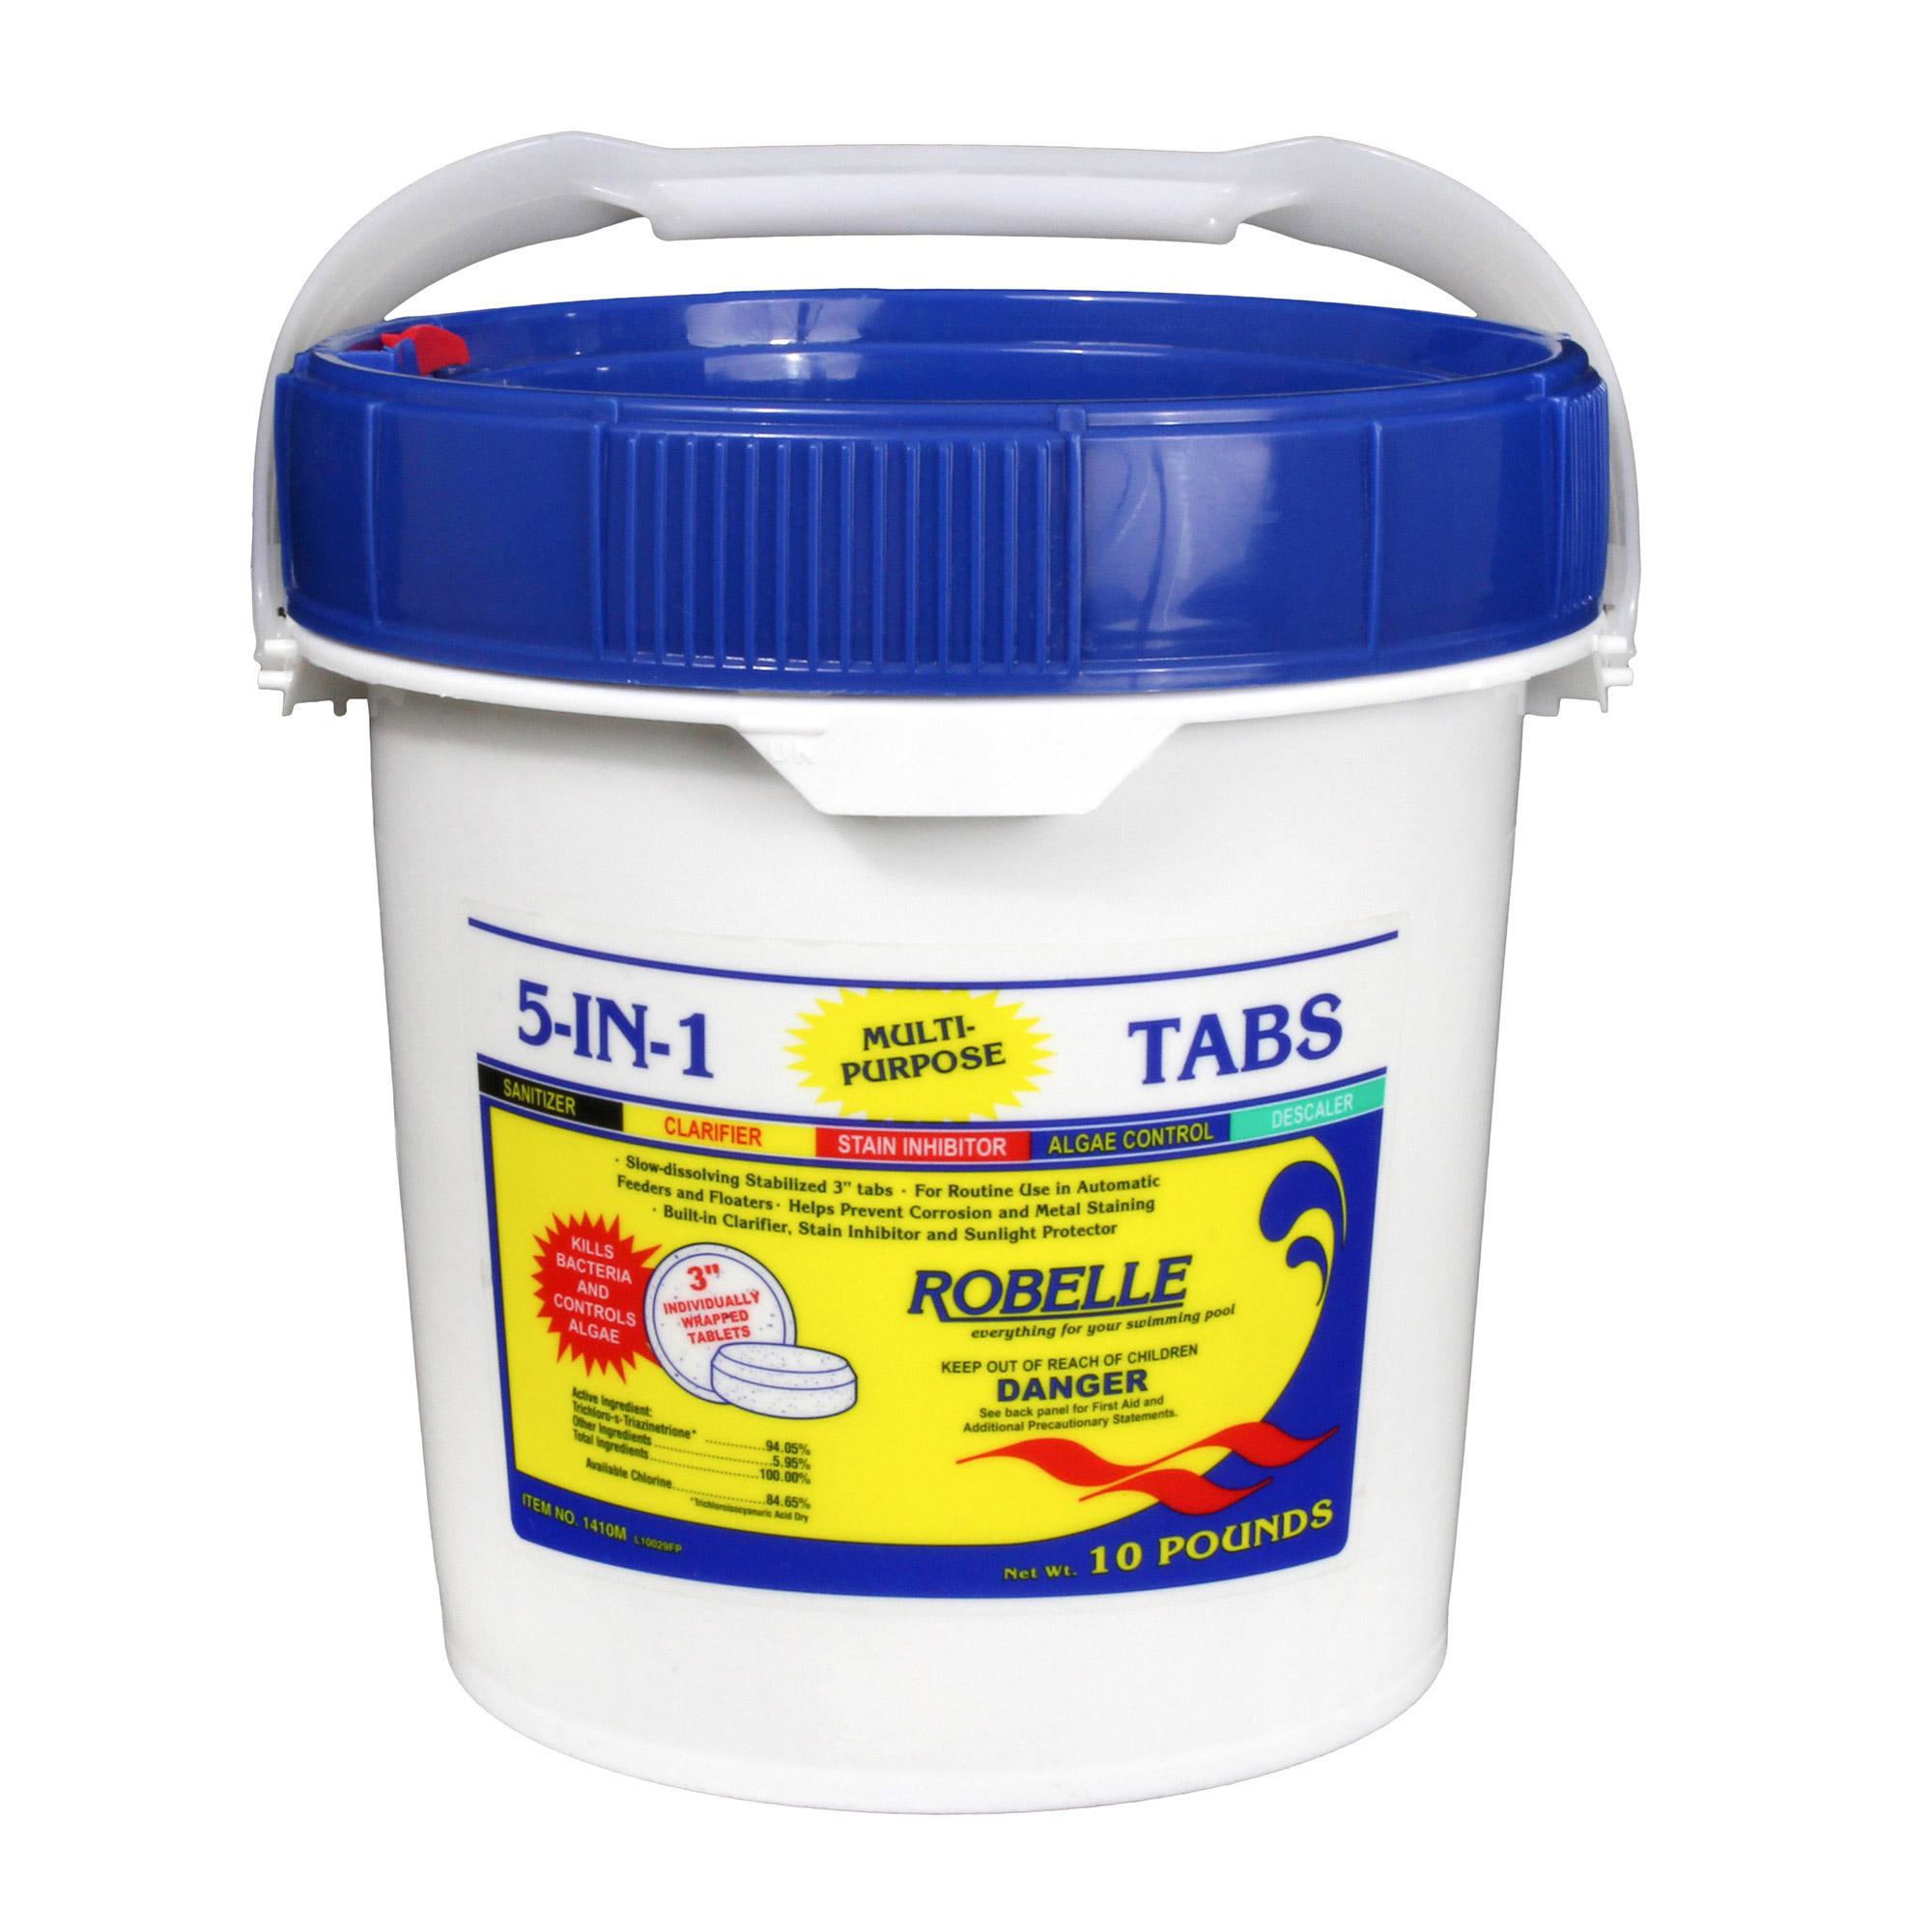 Robelle 5-in-1 Tabs - 40 Lbs | Pool Chemicals | Pool Supplies